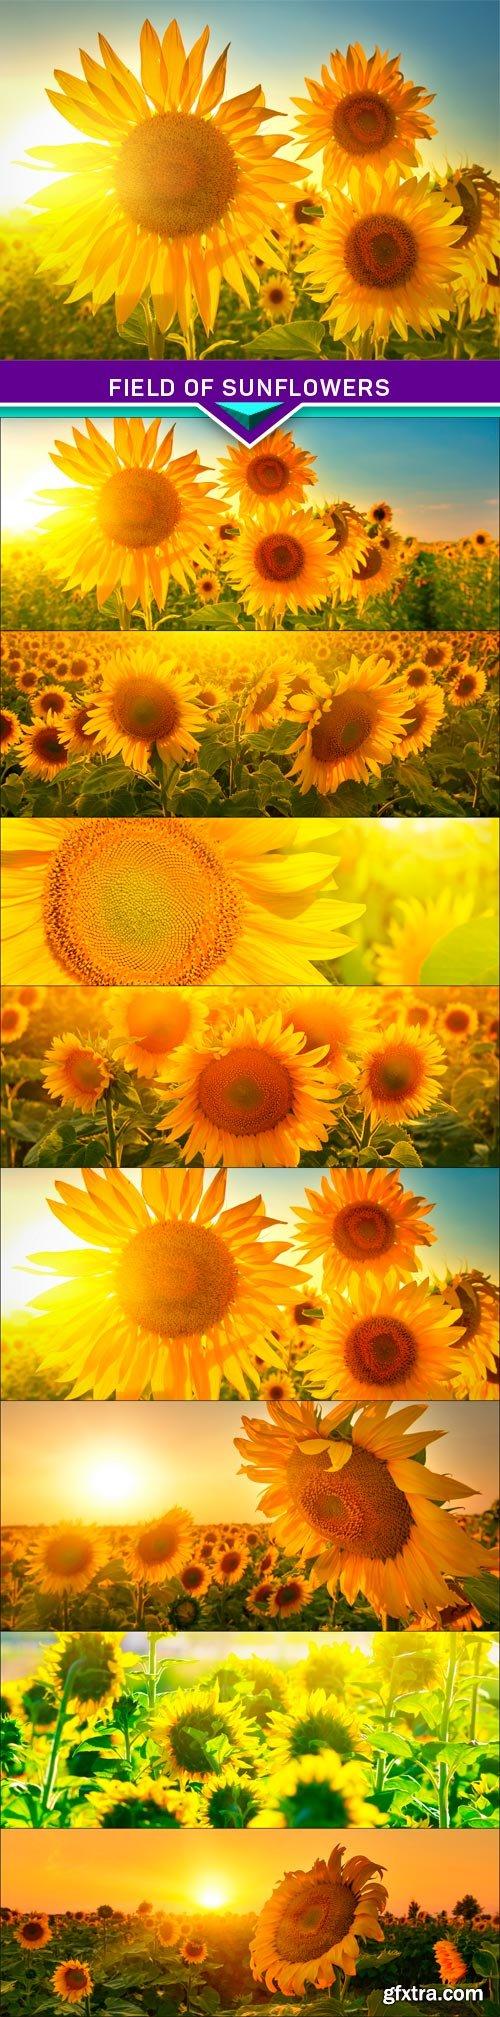 Field of sunflowers 8x JPEG